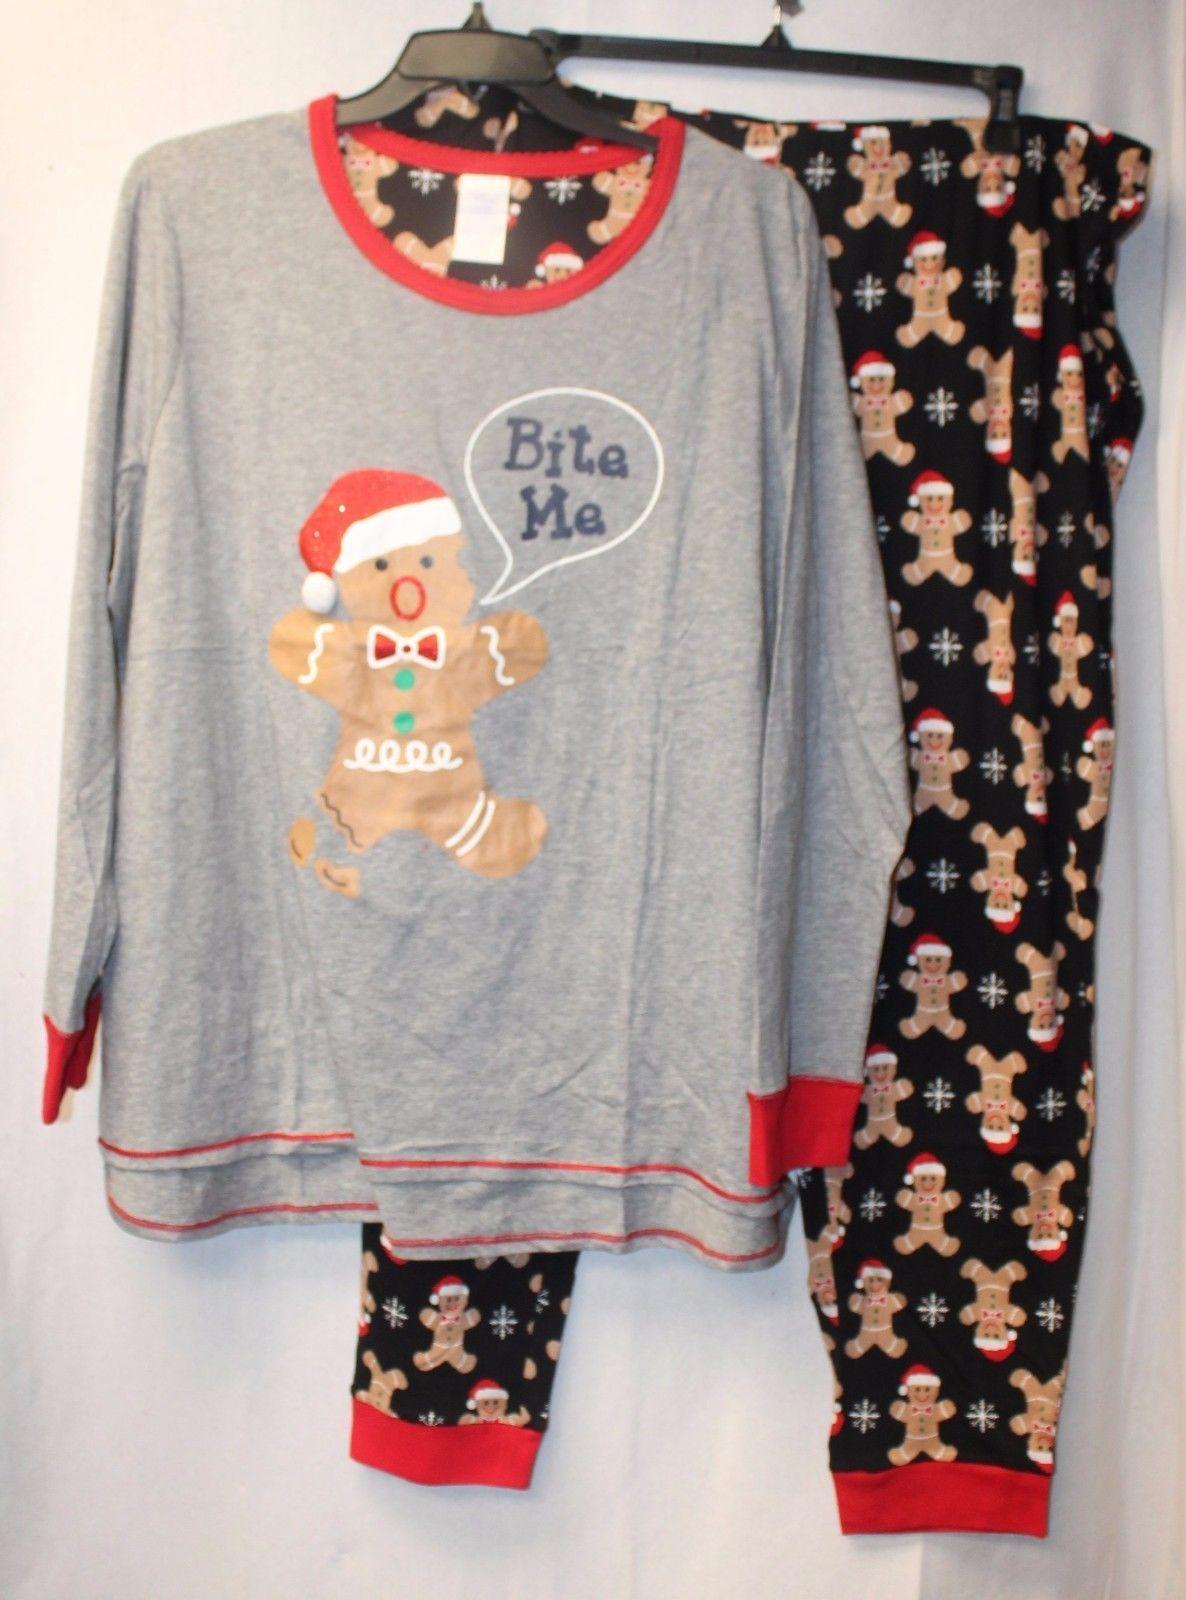 New Womens Plus Size 3X 2PC Christmas and 18 similar items. S l1600 6f37e4de5